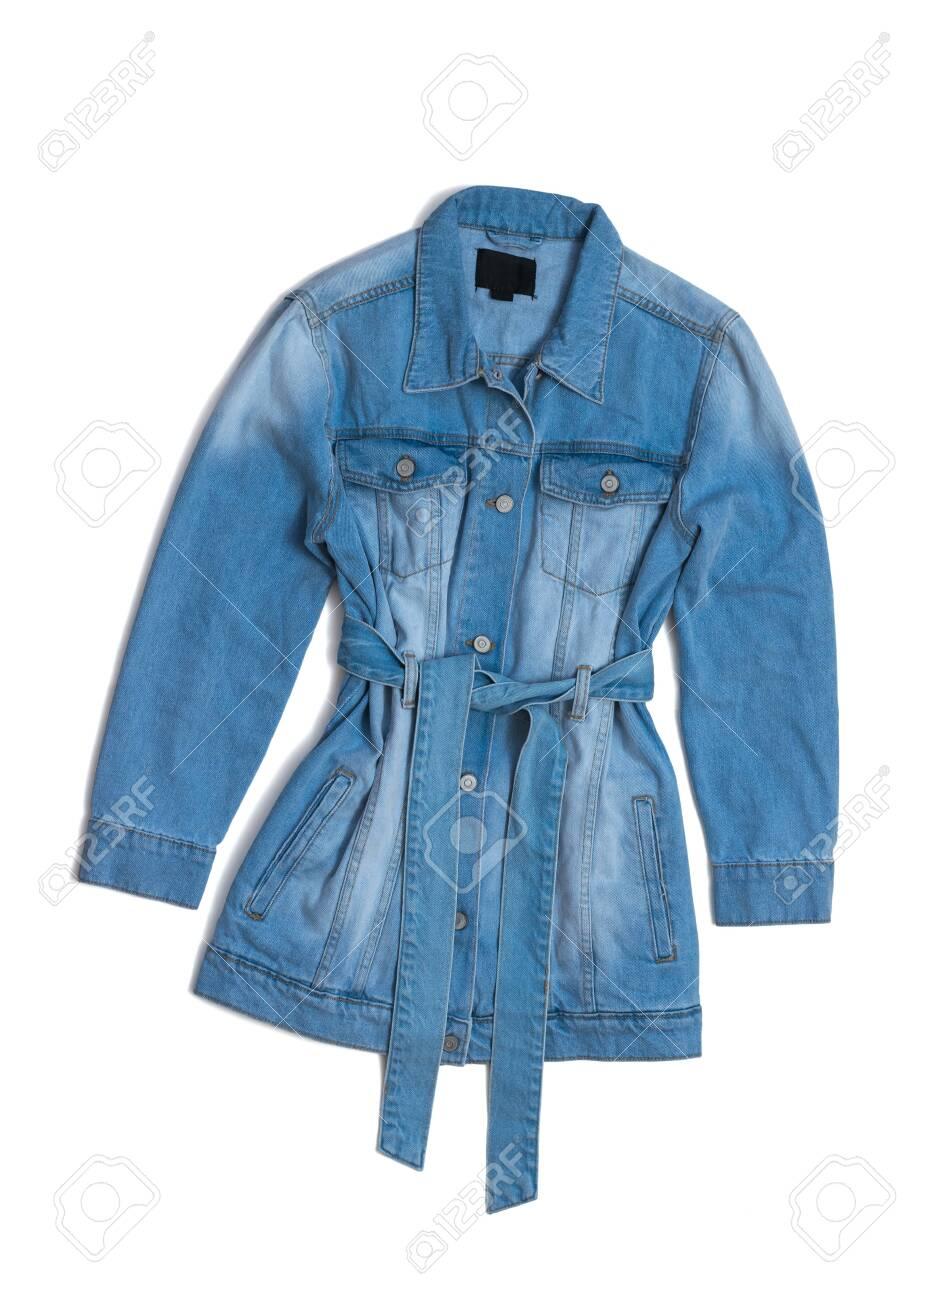 Fashionable denim long jacket with a belt isolated on a white background. Fashionable women's denim clothing. - 146775353